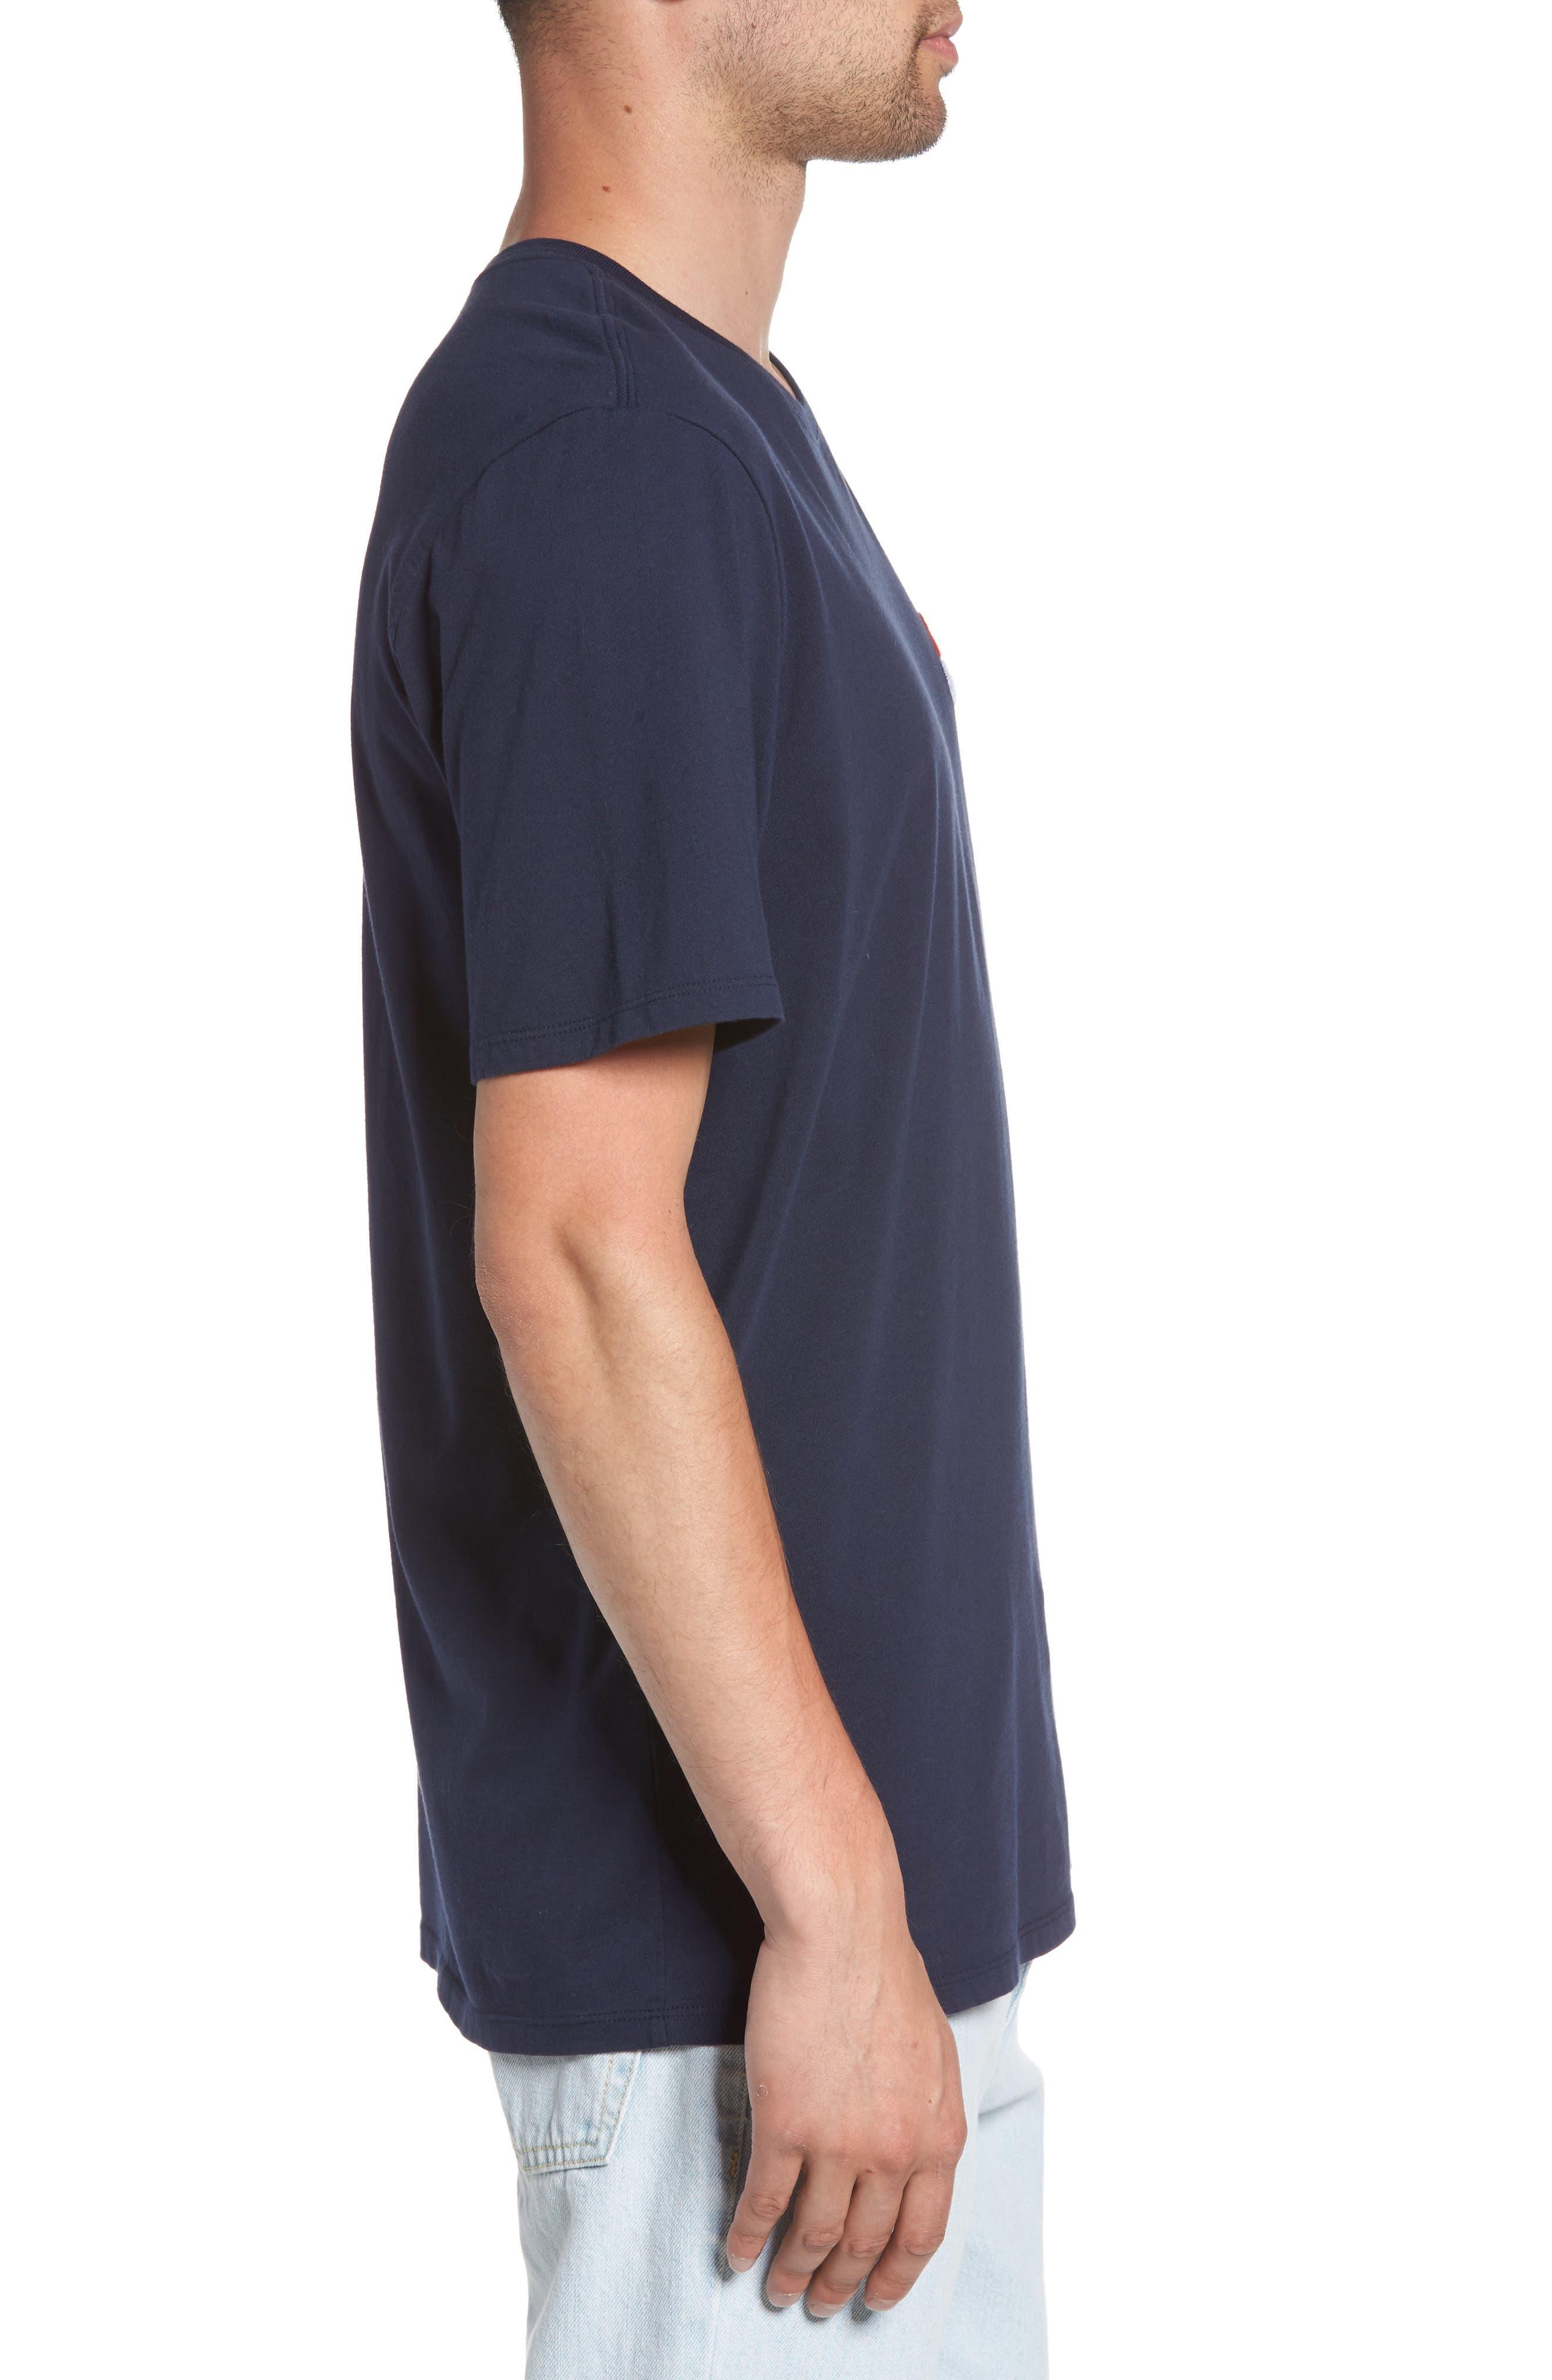 Nike Sportswear Futura T-Shirt,                             Alternate thumbnail 3, color,                             Obsidian